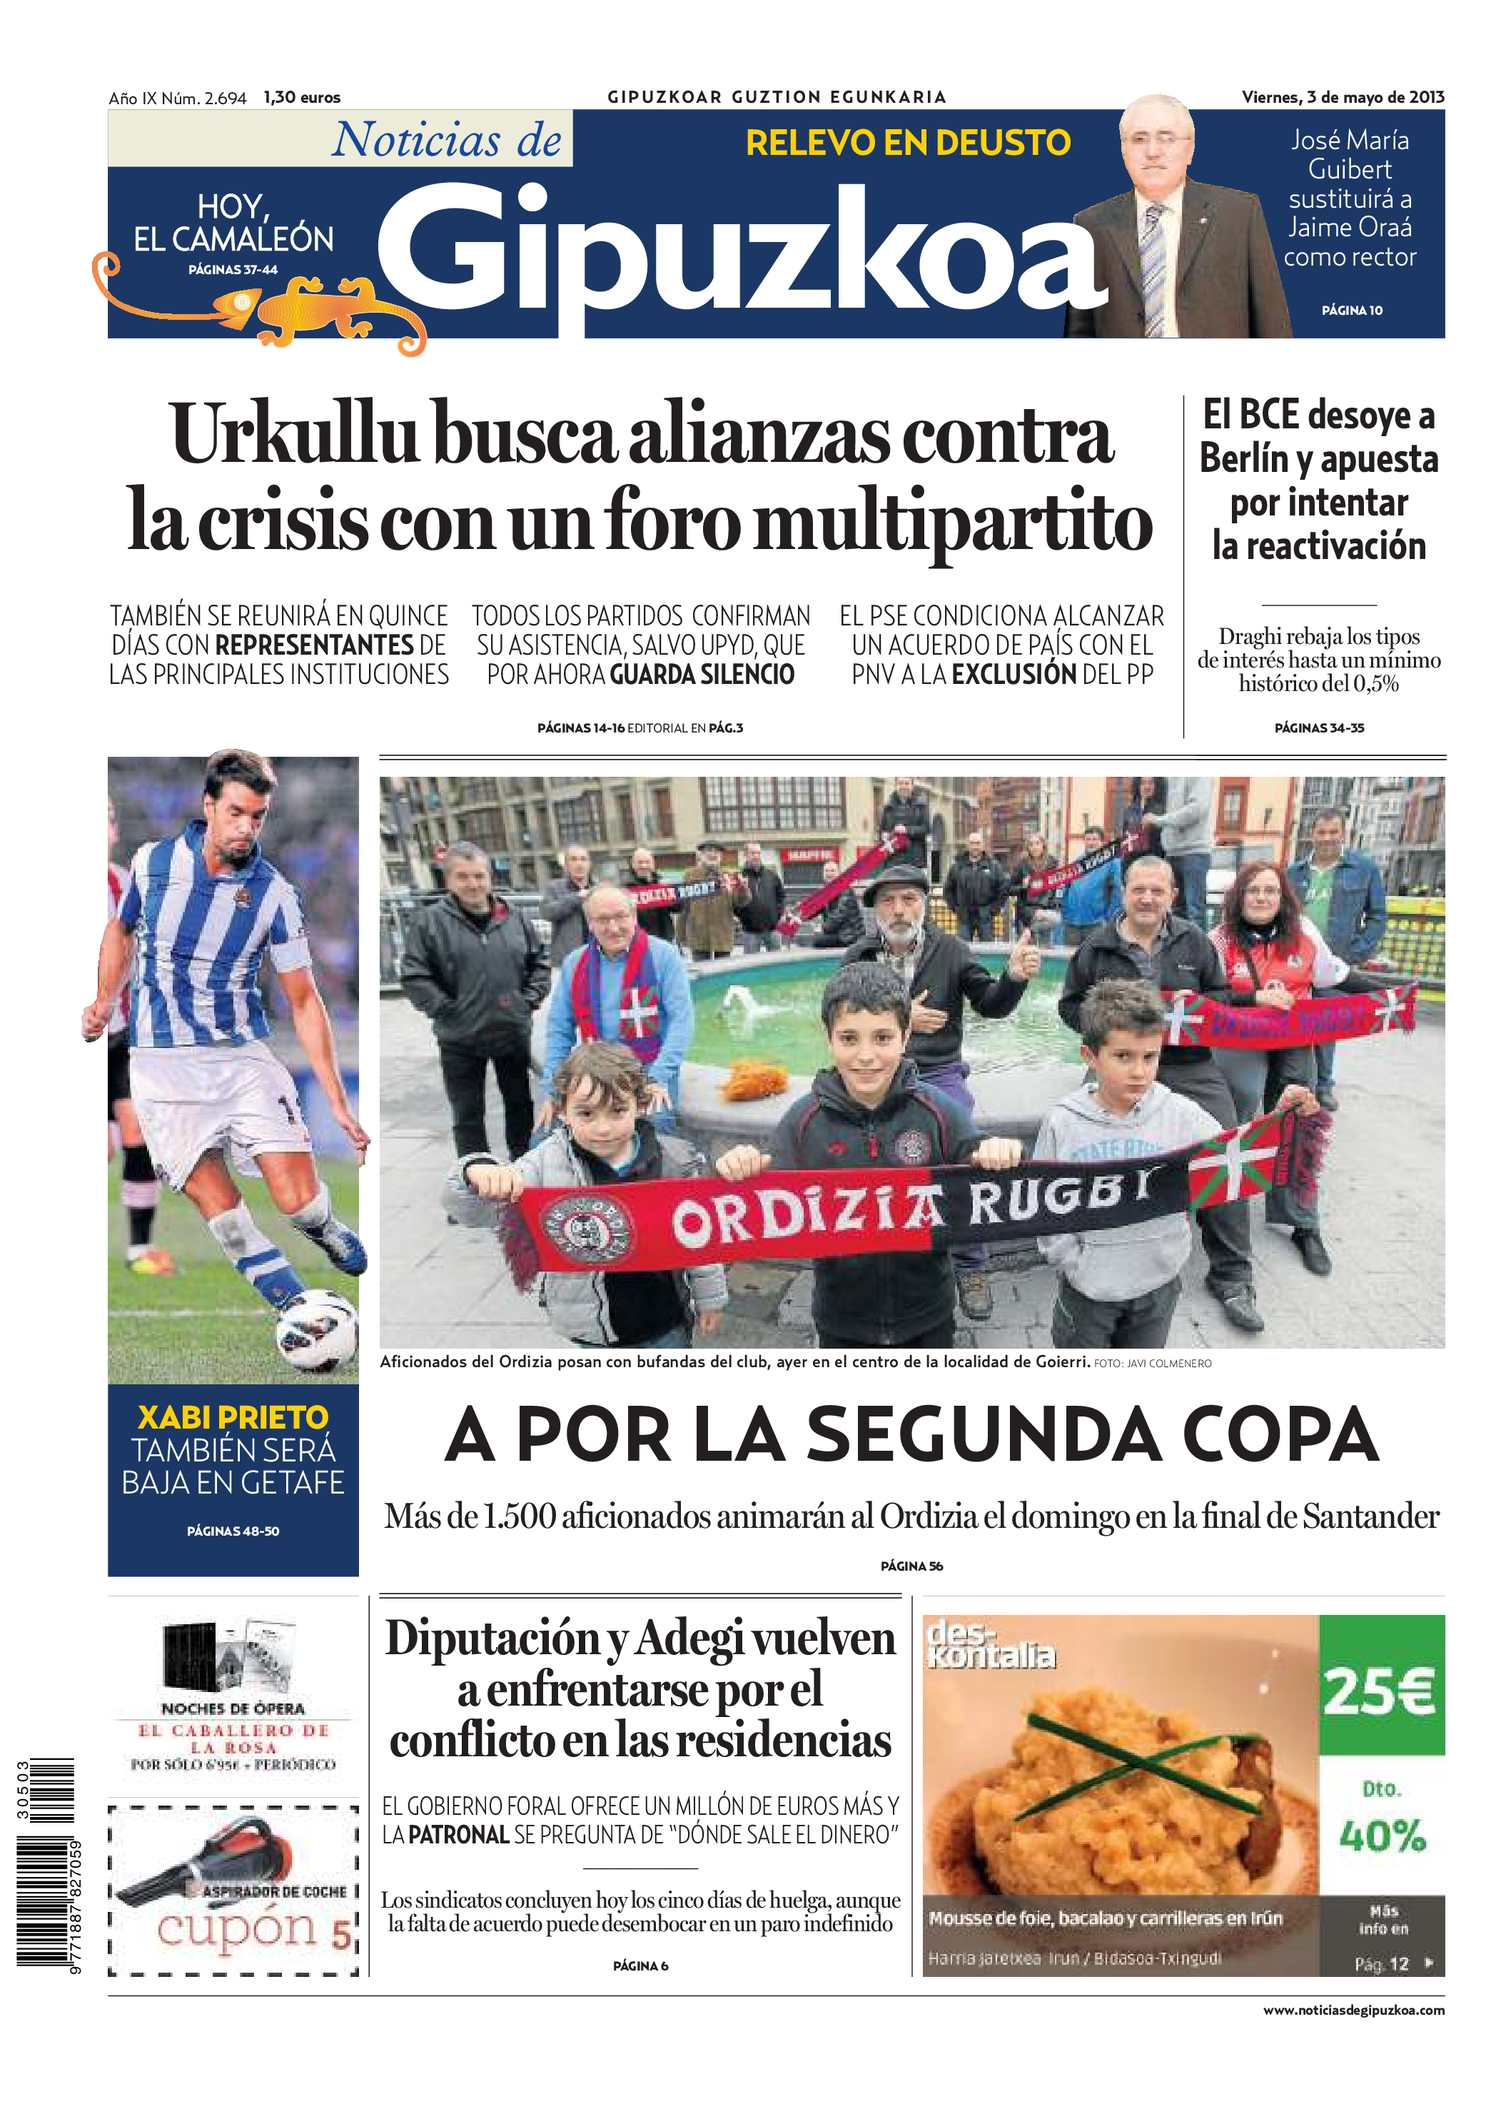 Calameo Noticias De Gipuzkoa 20130503